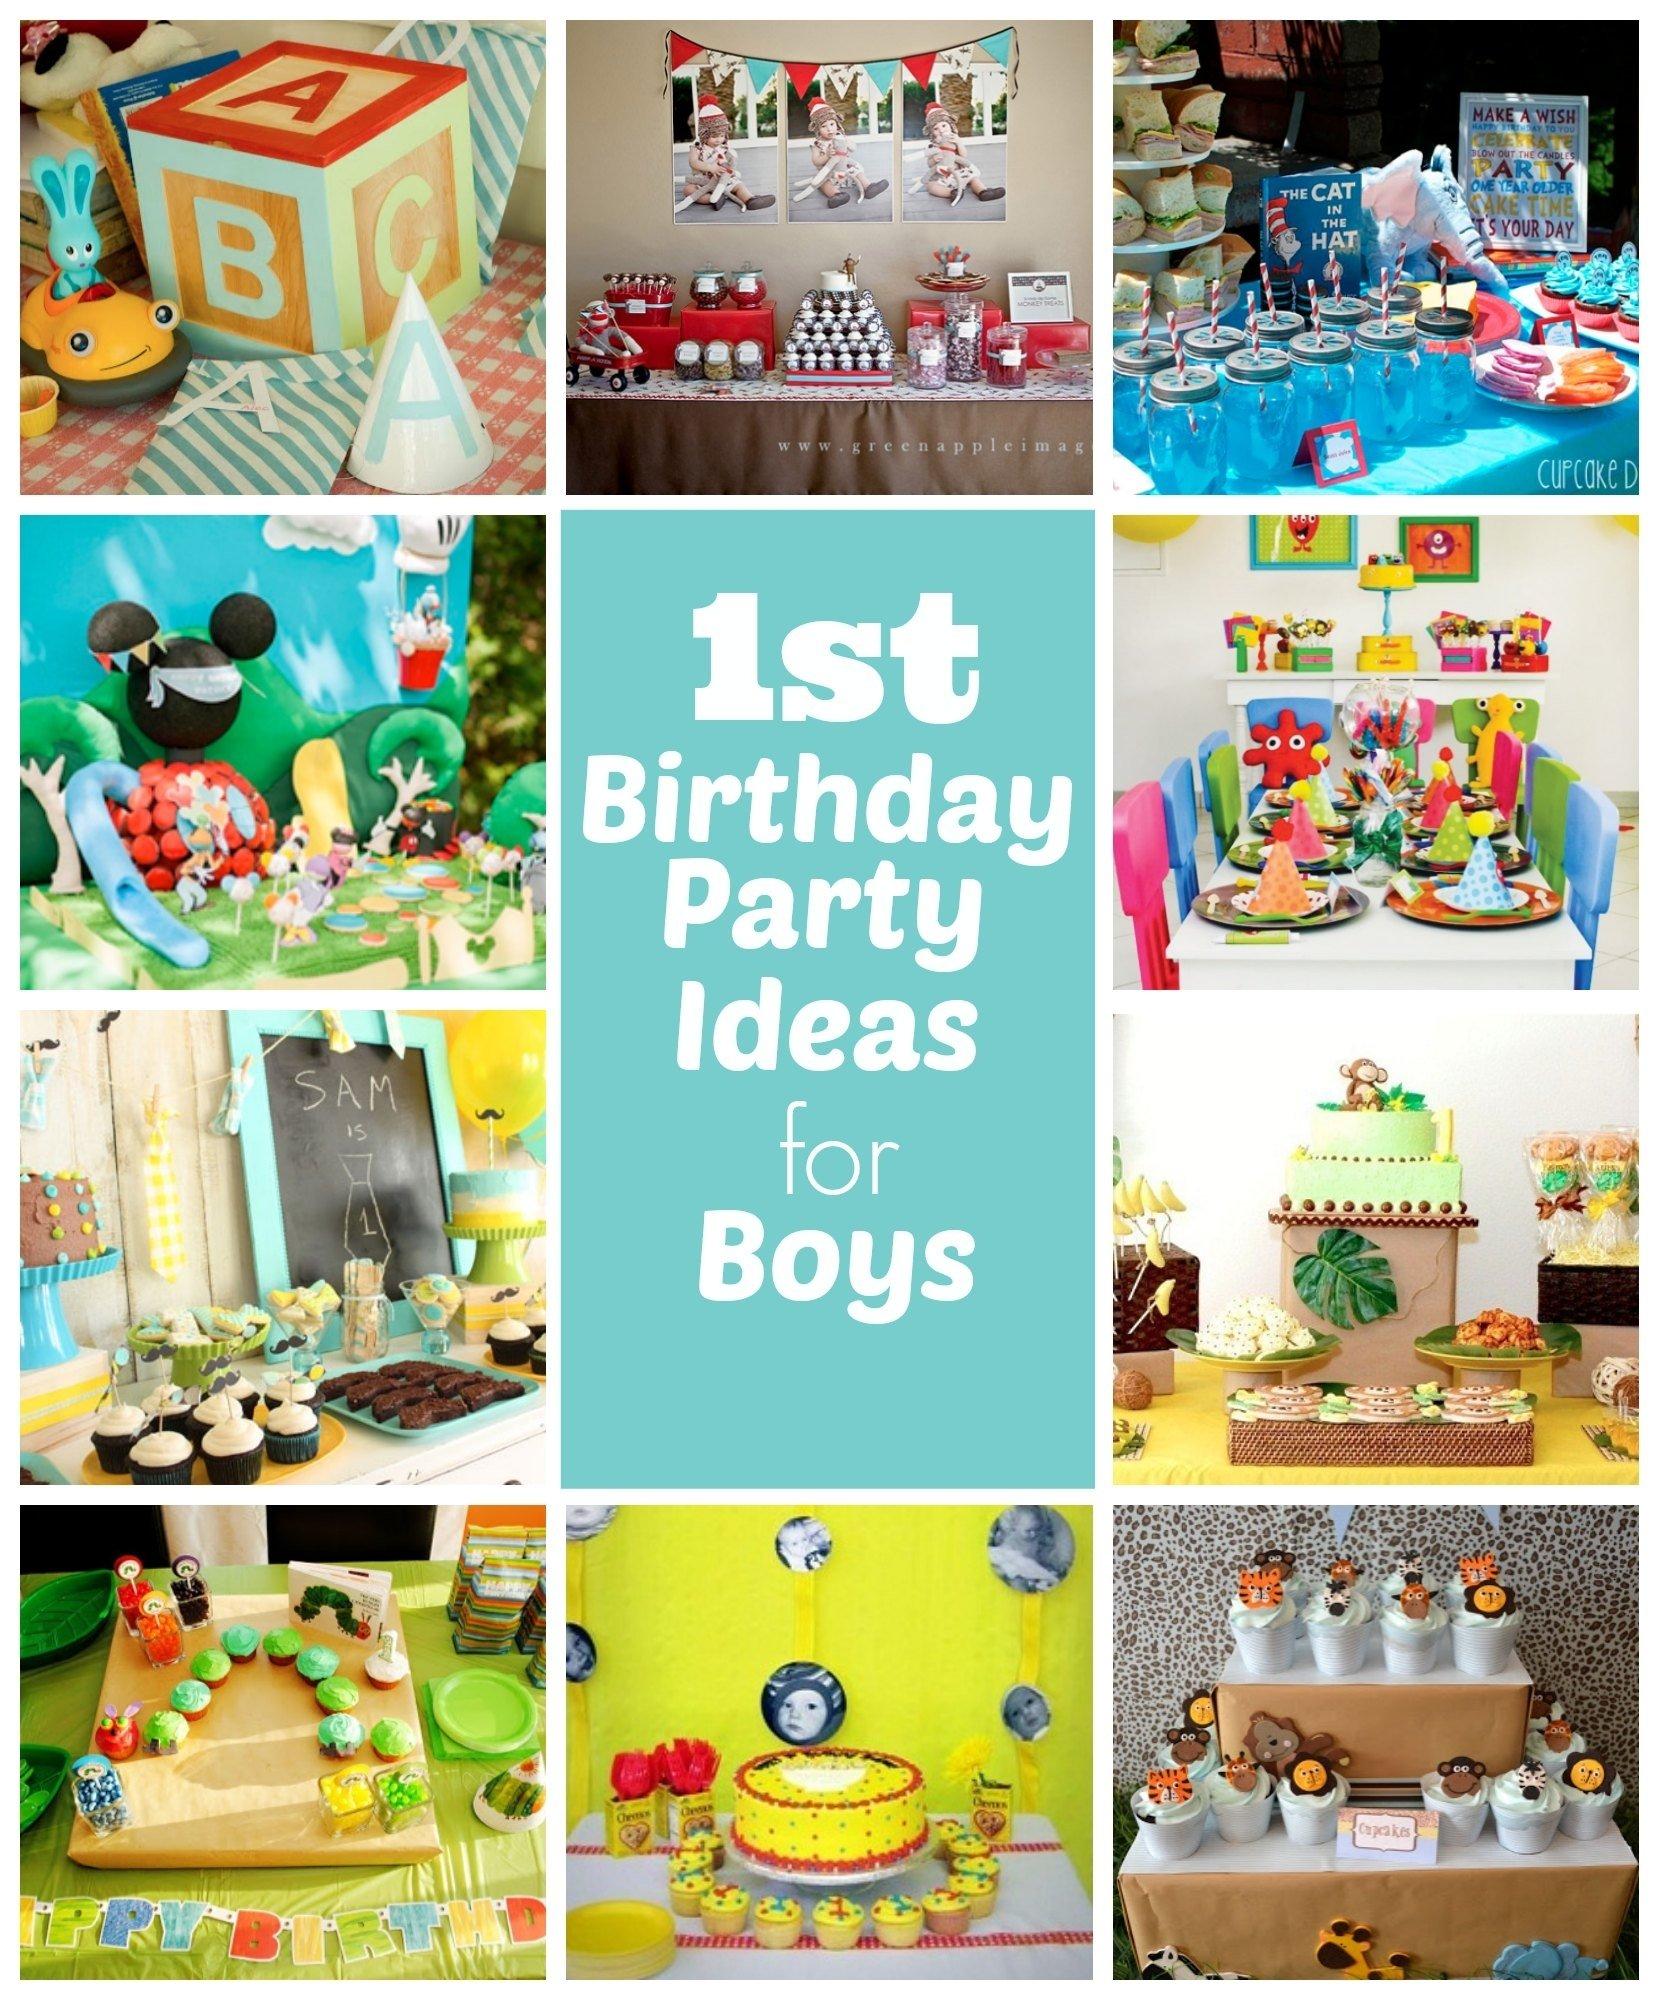 10 Fashionable 1St Boy Birthday Party Ideas 1st birthday party ideas for boys great ideas including very 2020